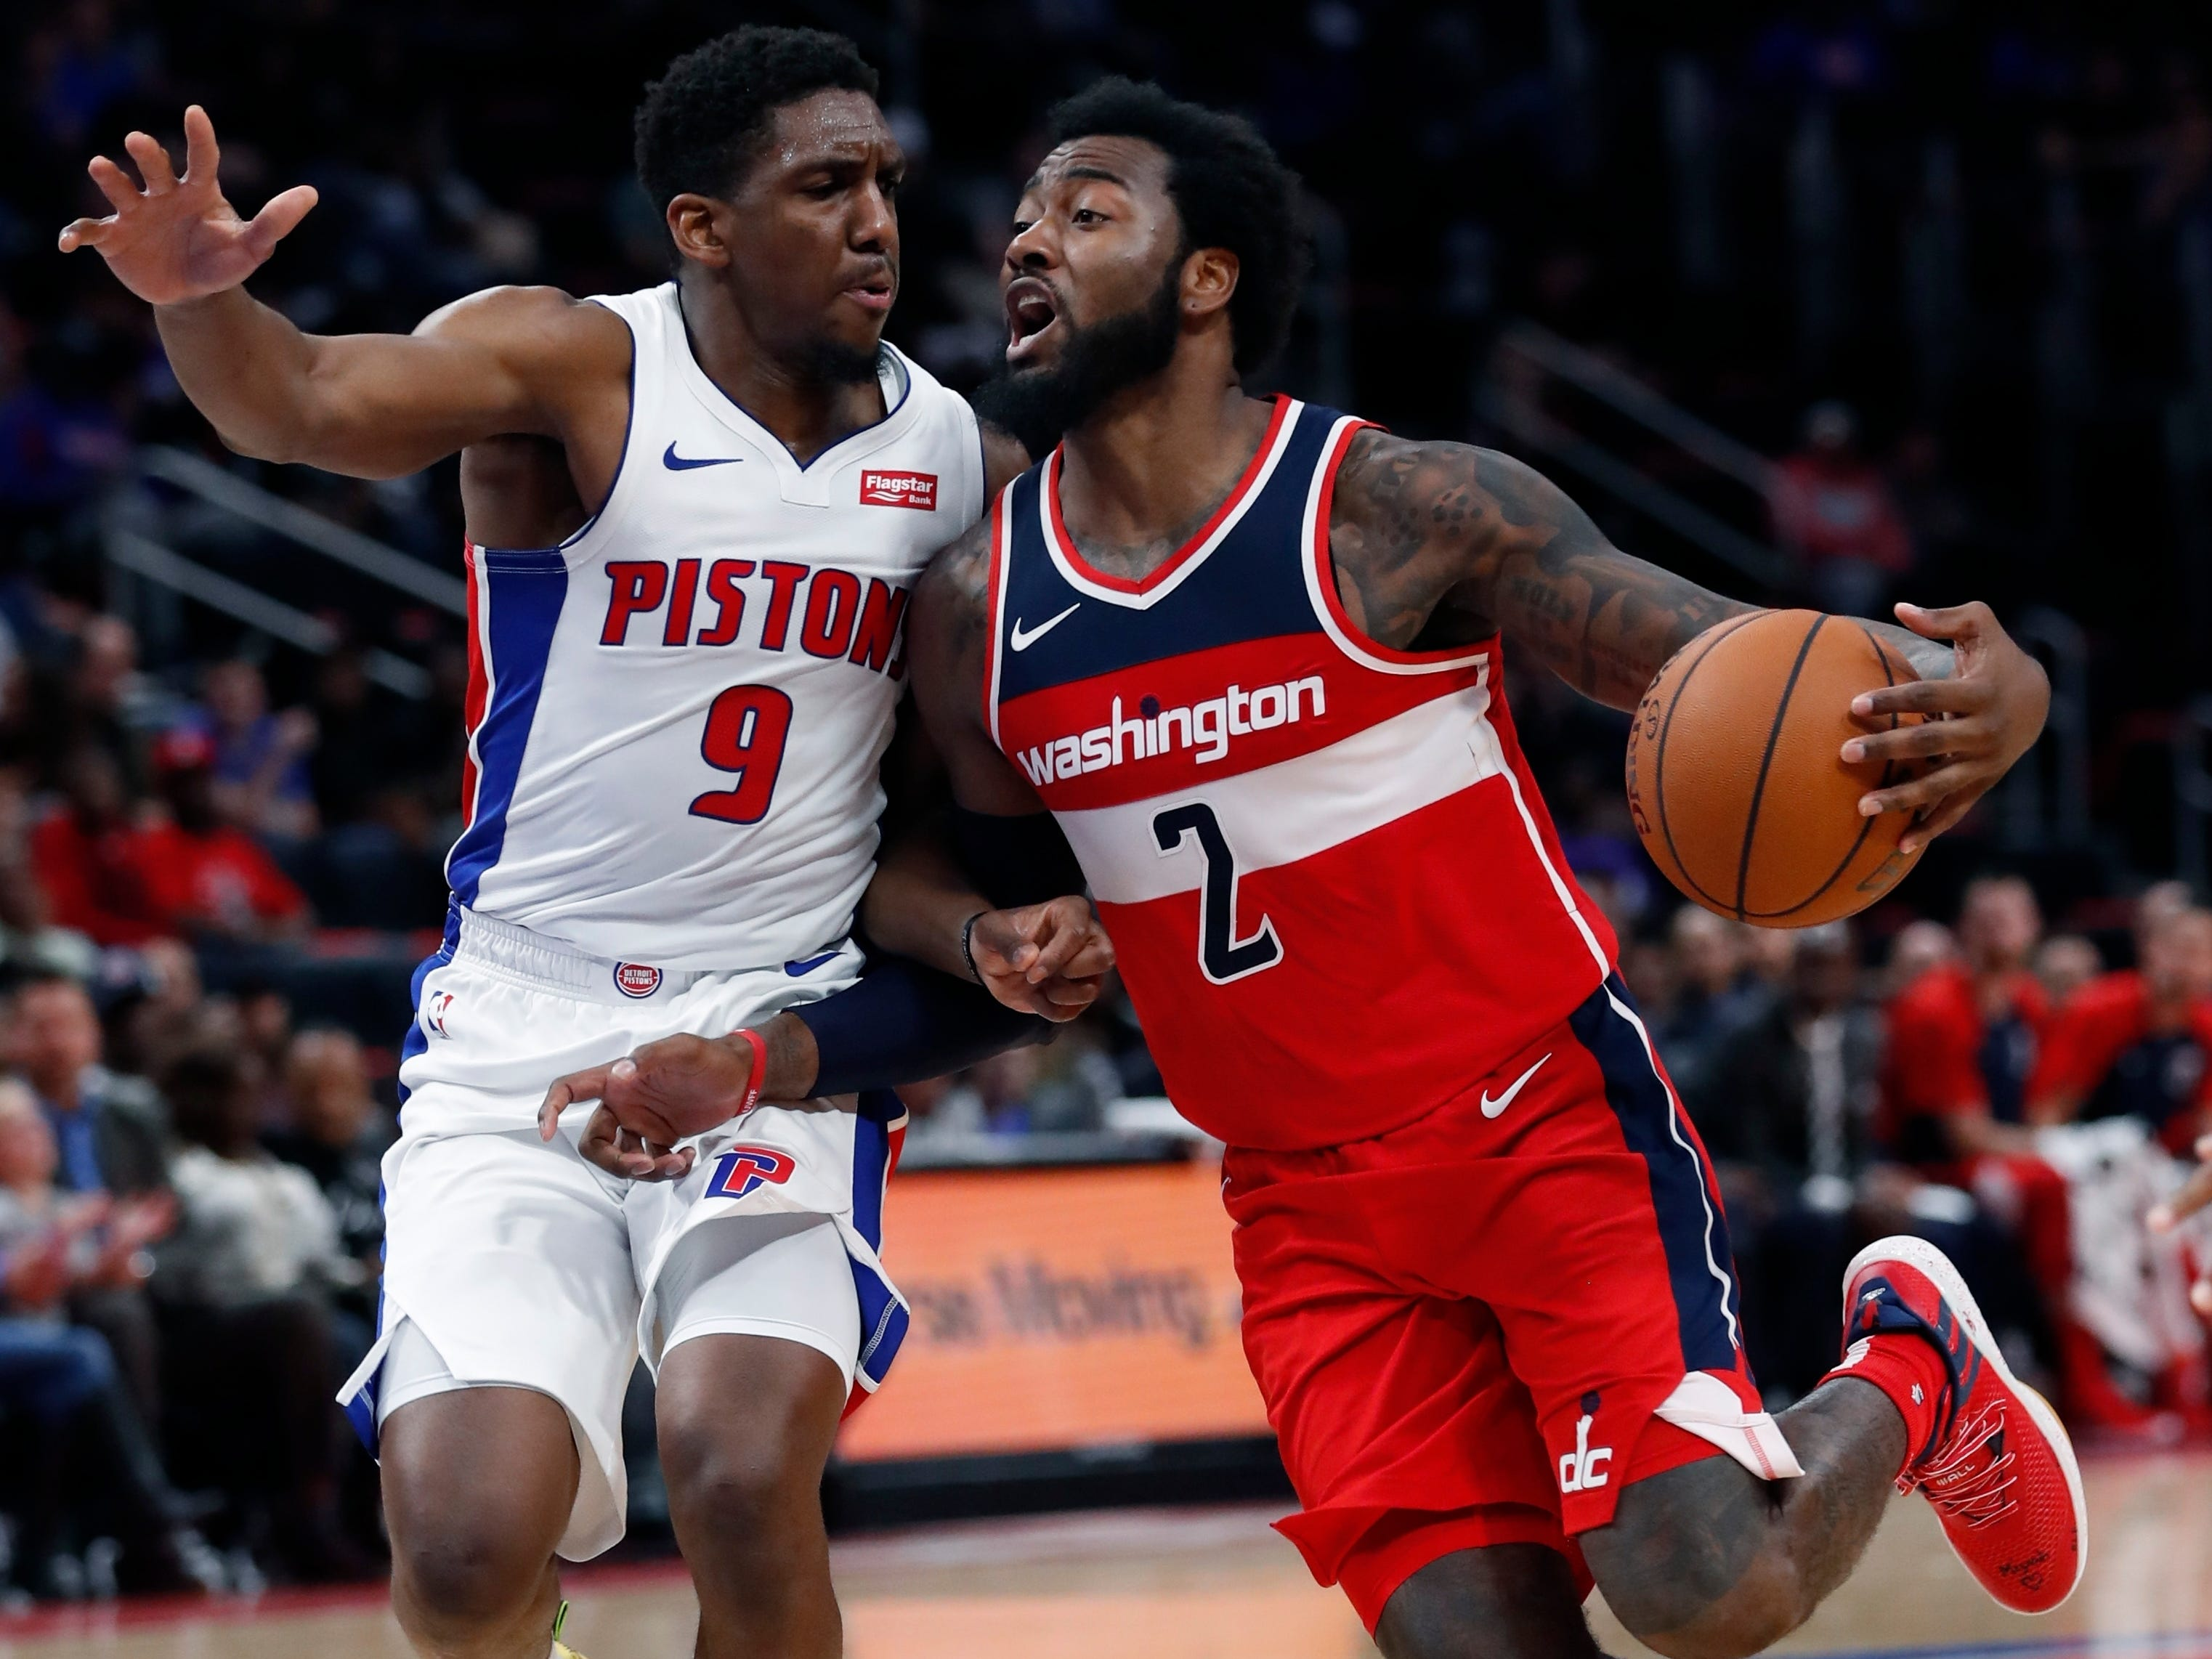 Washington Wizards guard John Wall (2) drives on Detroit Pistons guard Langston Galloway (9) during the second half.